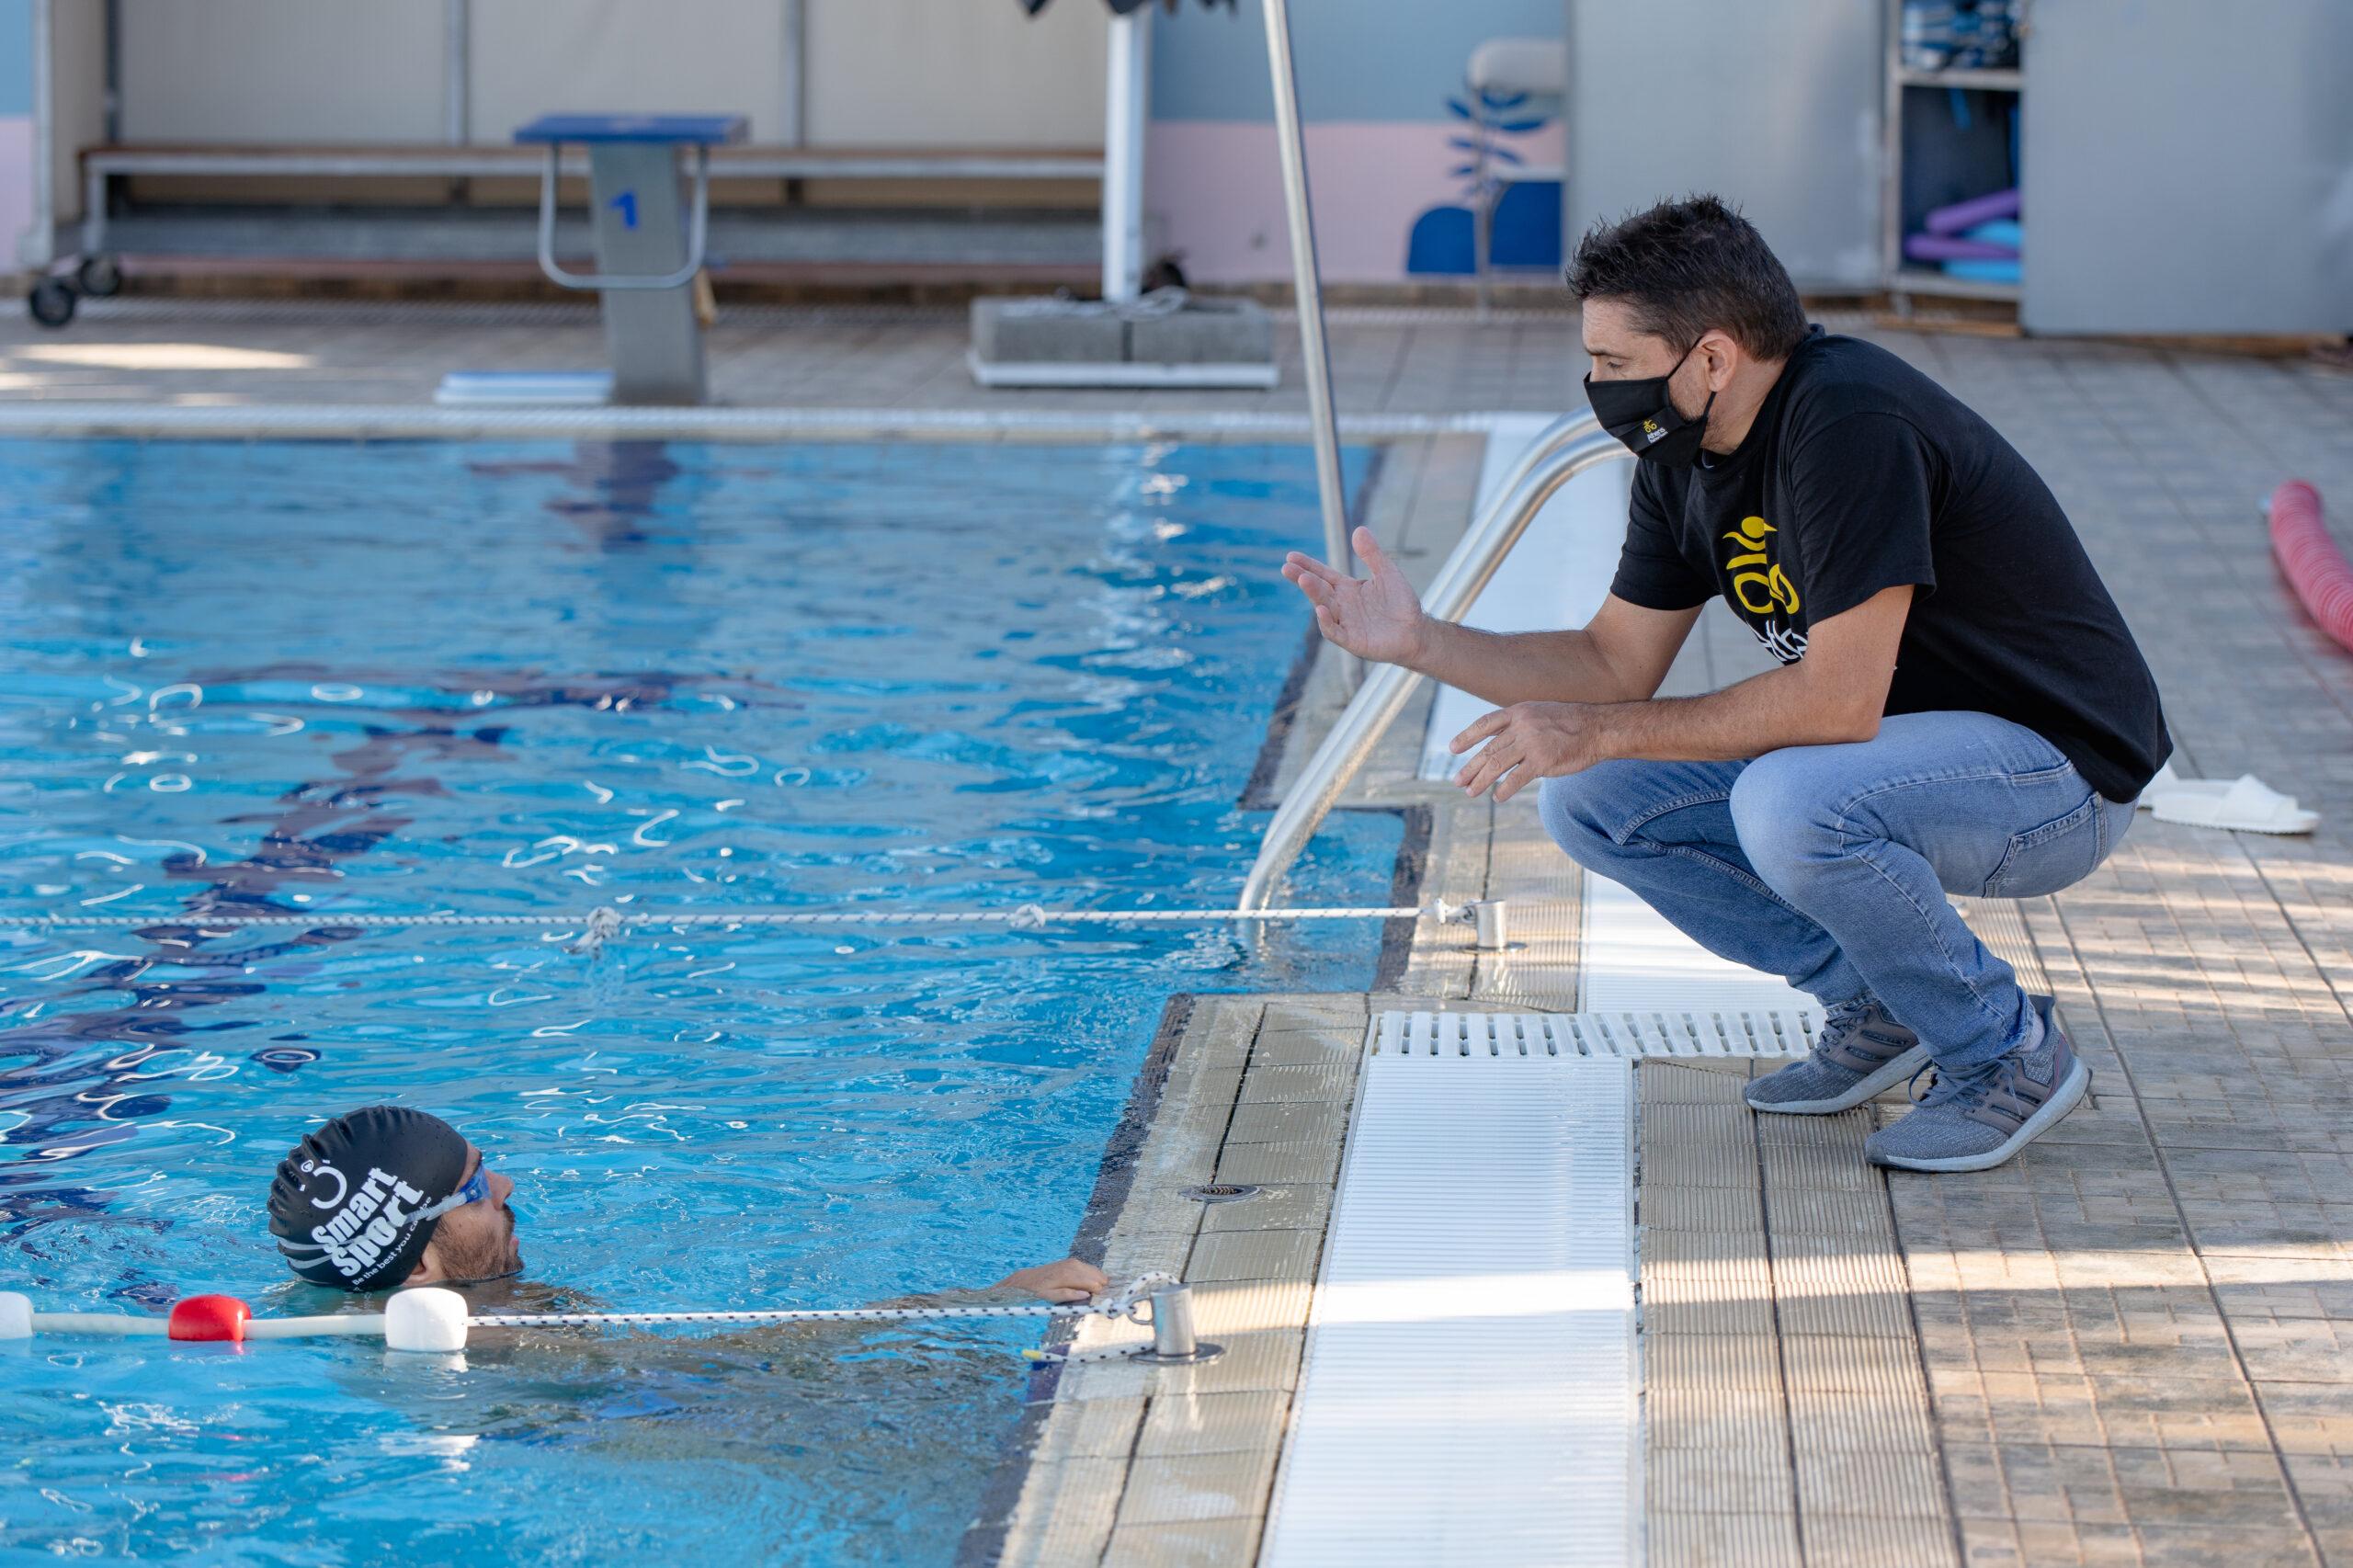 To Δημοτικό κολυμβητήριο Αλίμου επέλεξε η Athens Triathlon Team για την προετοιμασία της για το 2021.